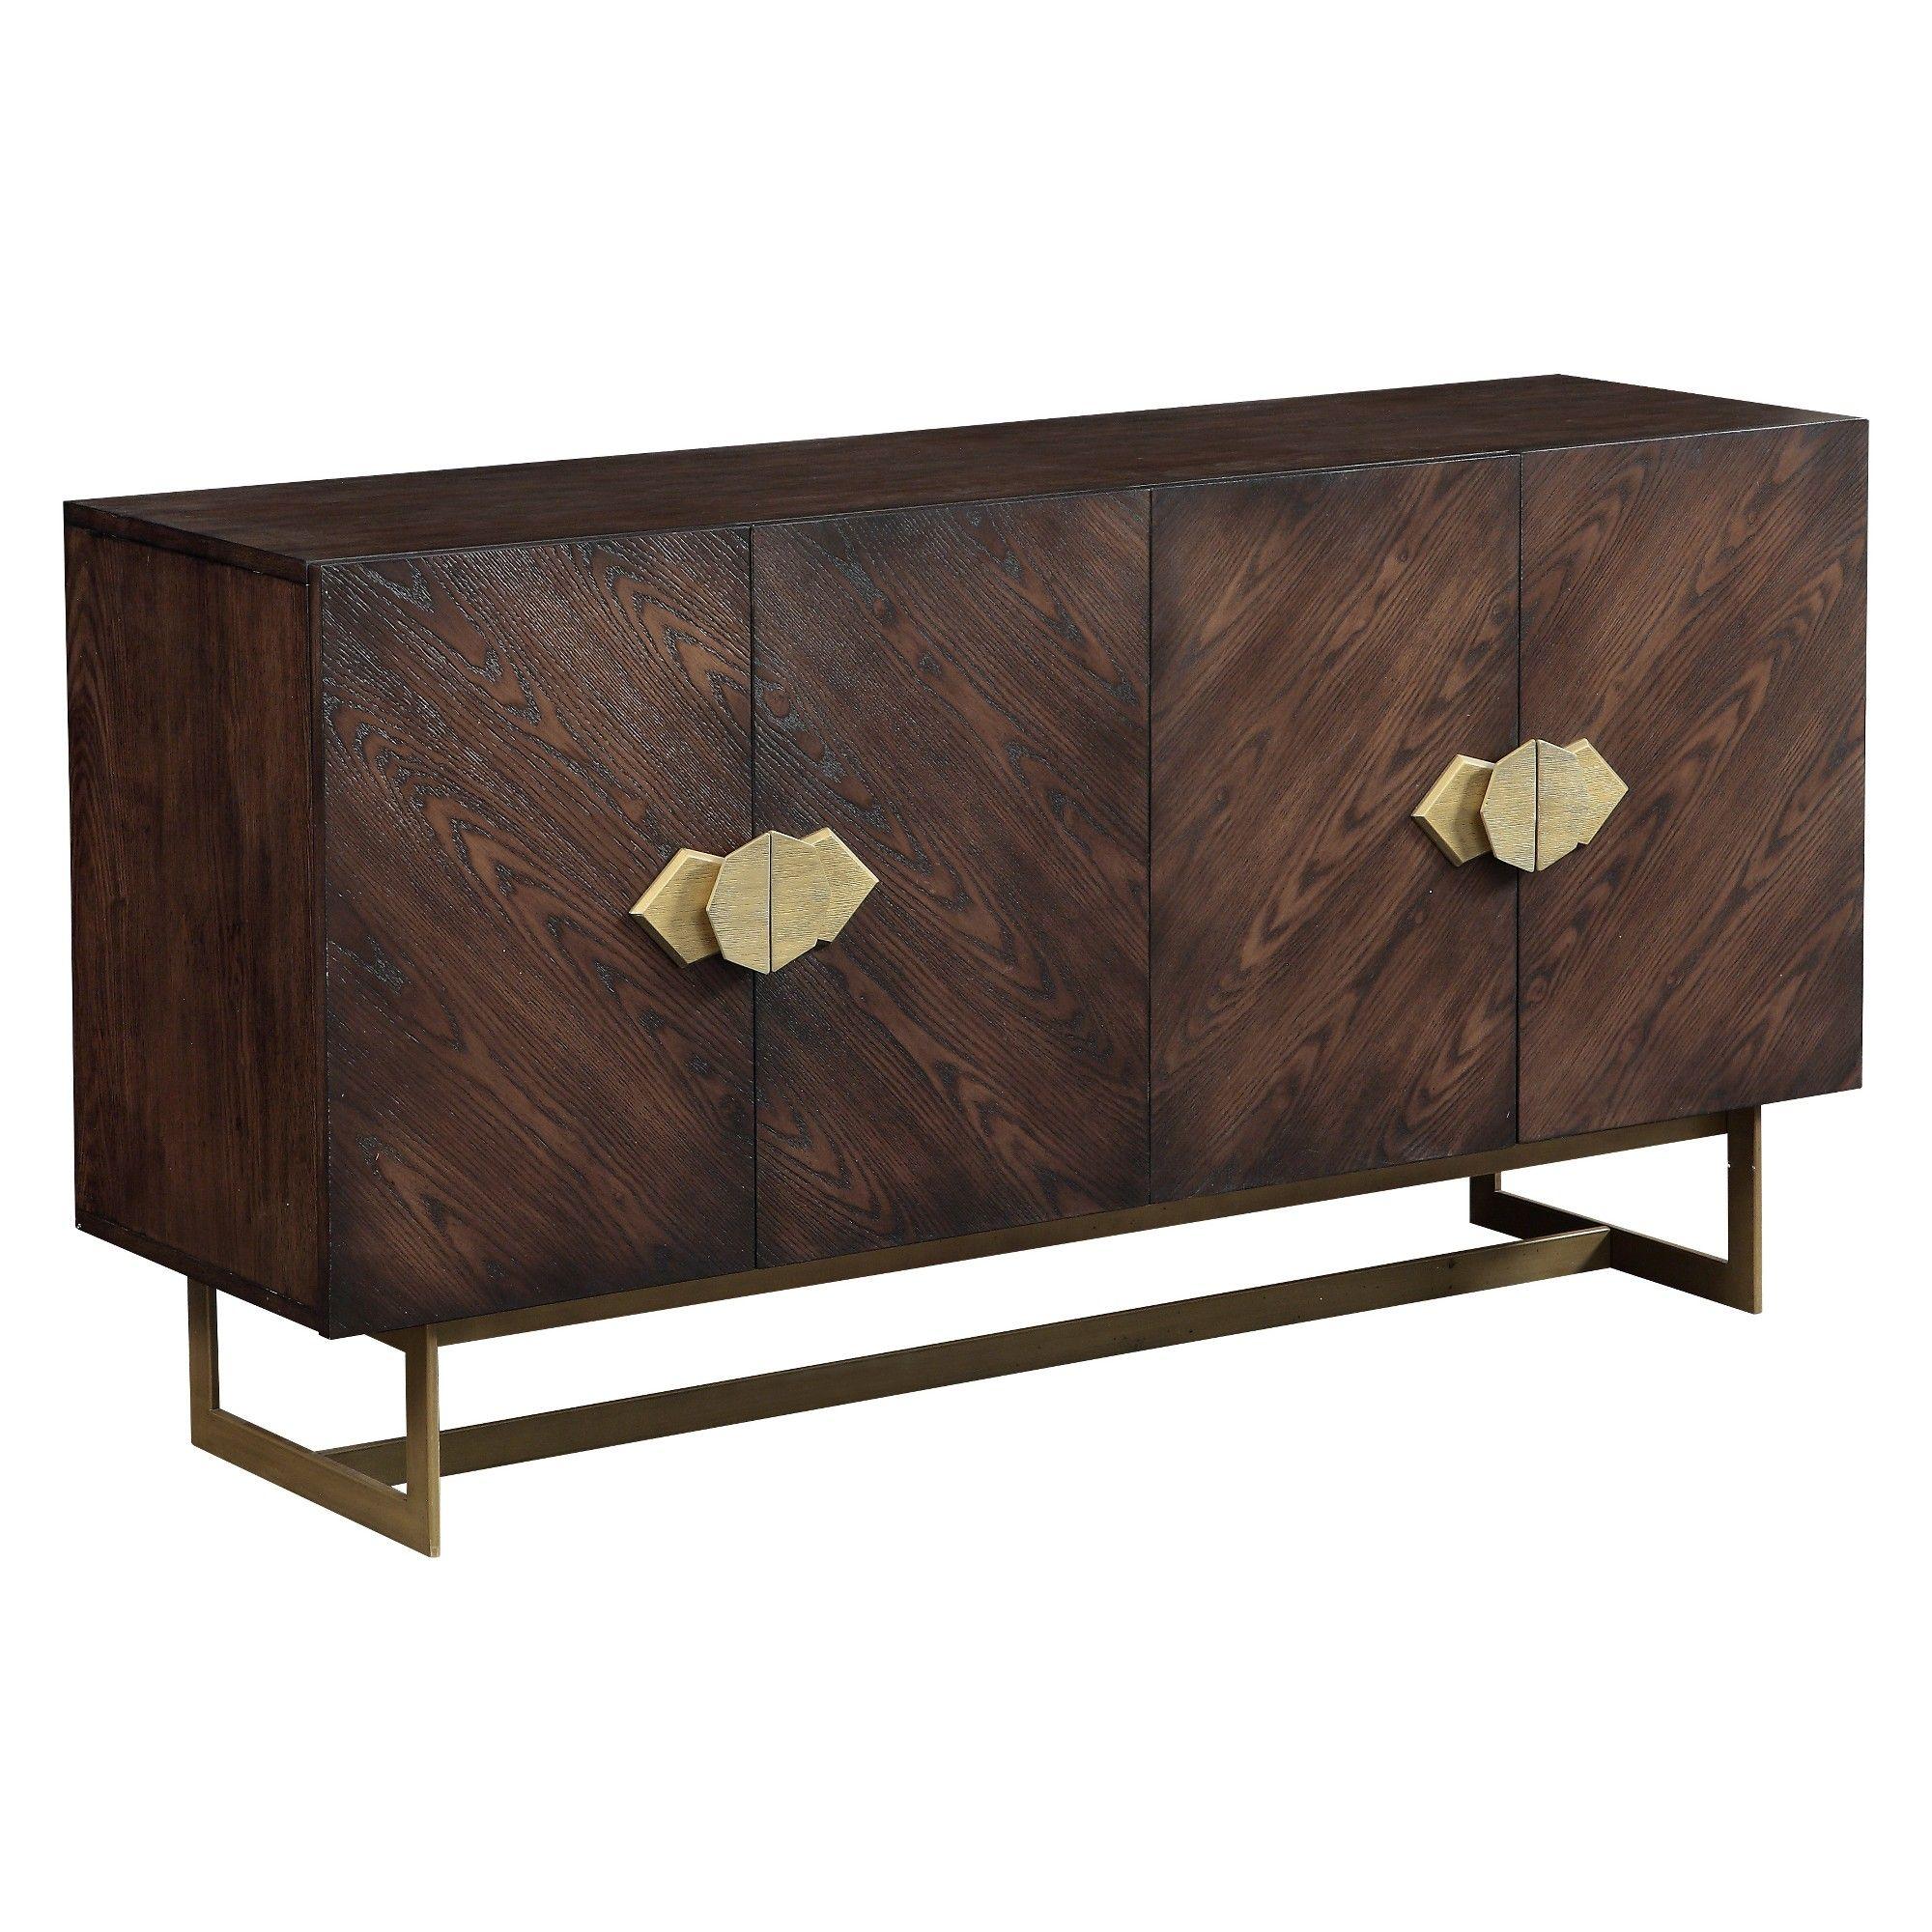 Christopher Knight Home Braxton Media Credenza Brown Furniture